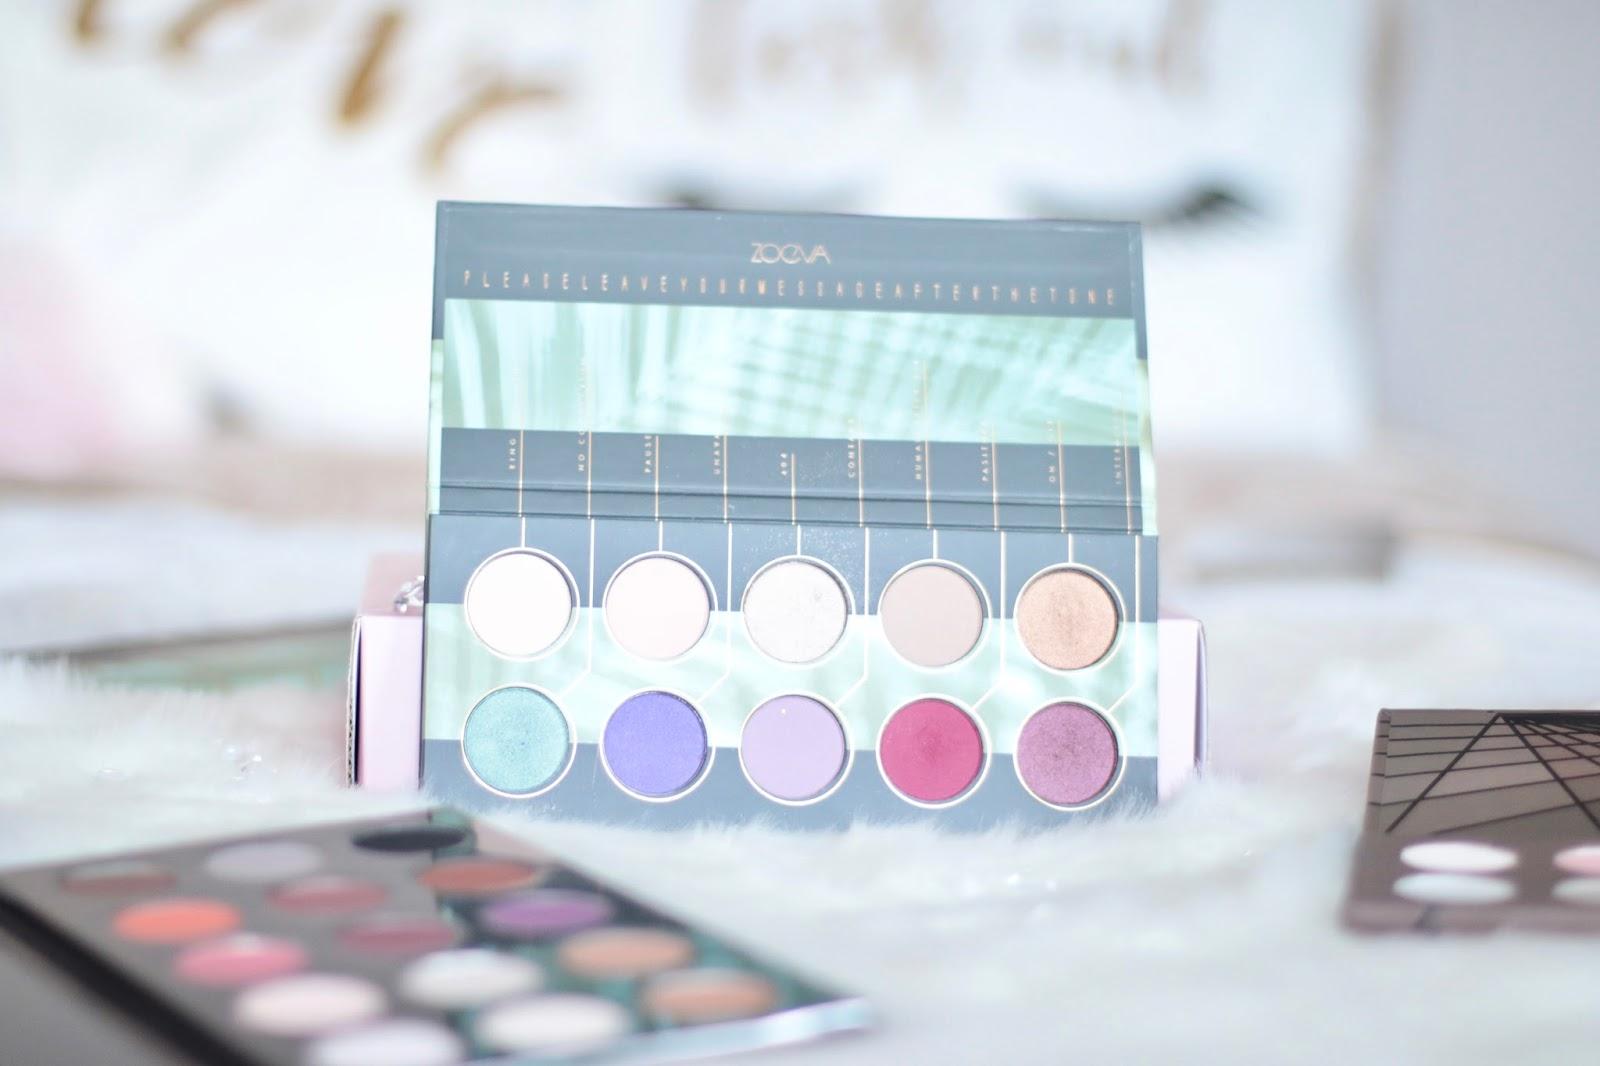 Zoeva Offline Eyeshadow Palette - Recenzja & Swatche